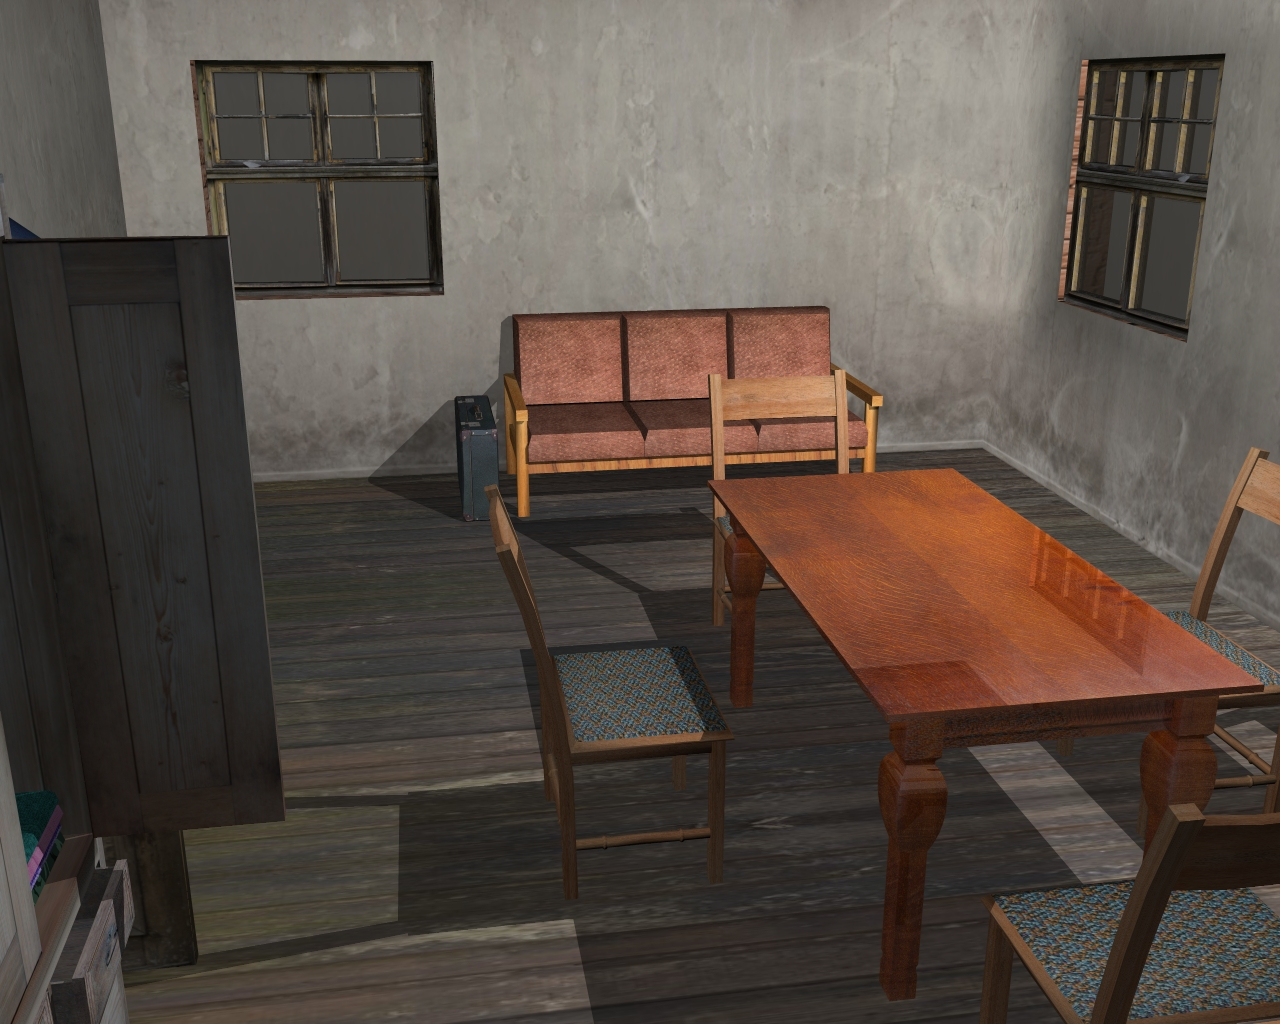 wooden house 2 3d model 3ds 166197